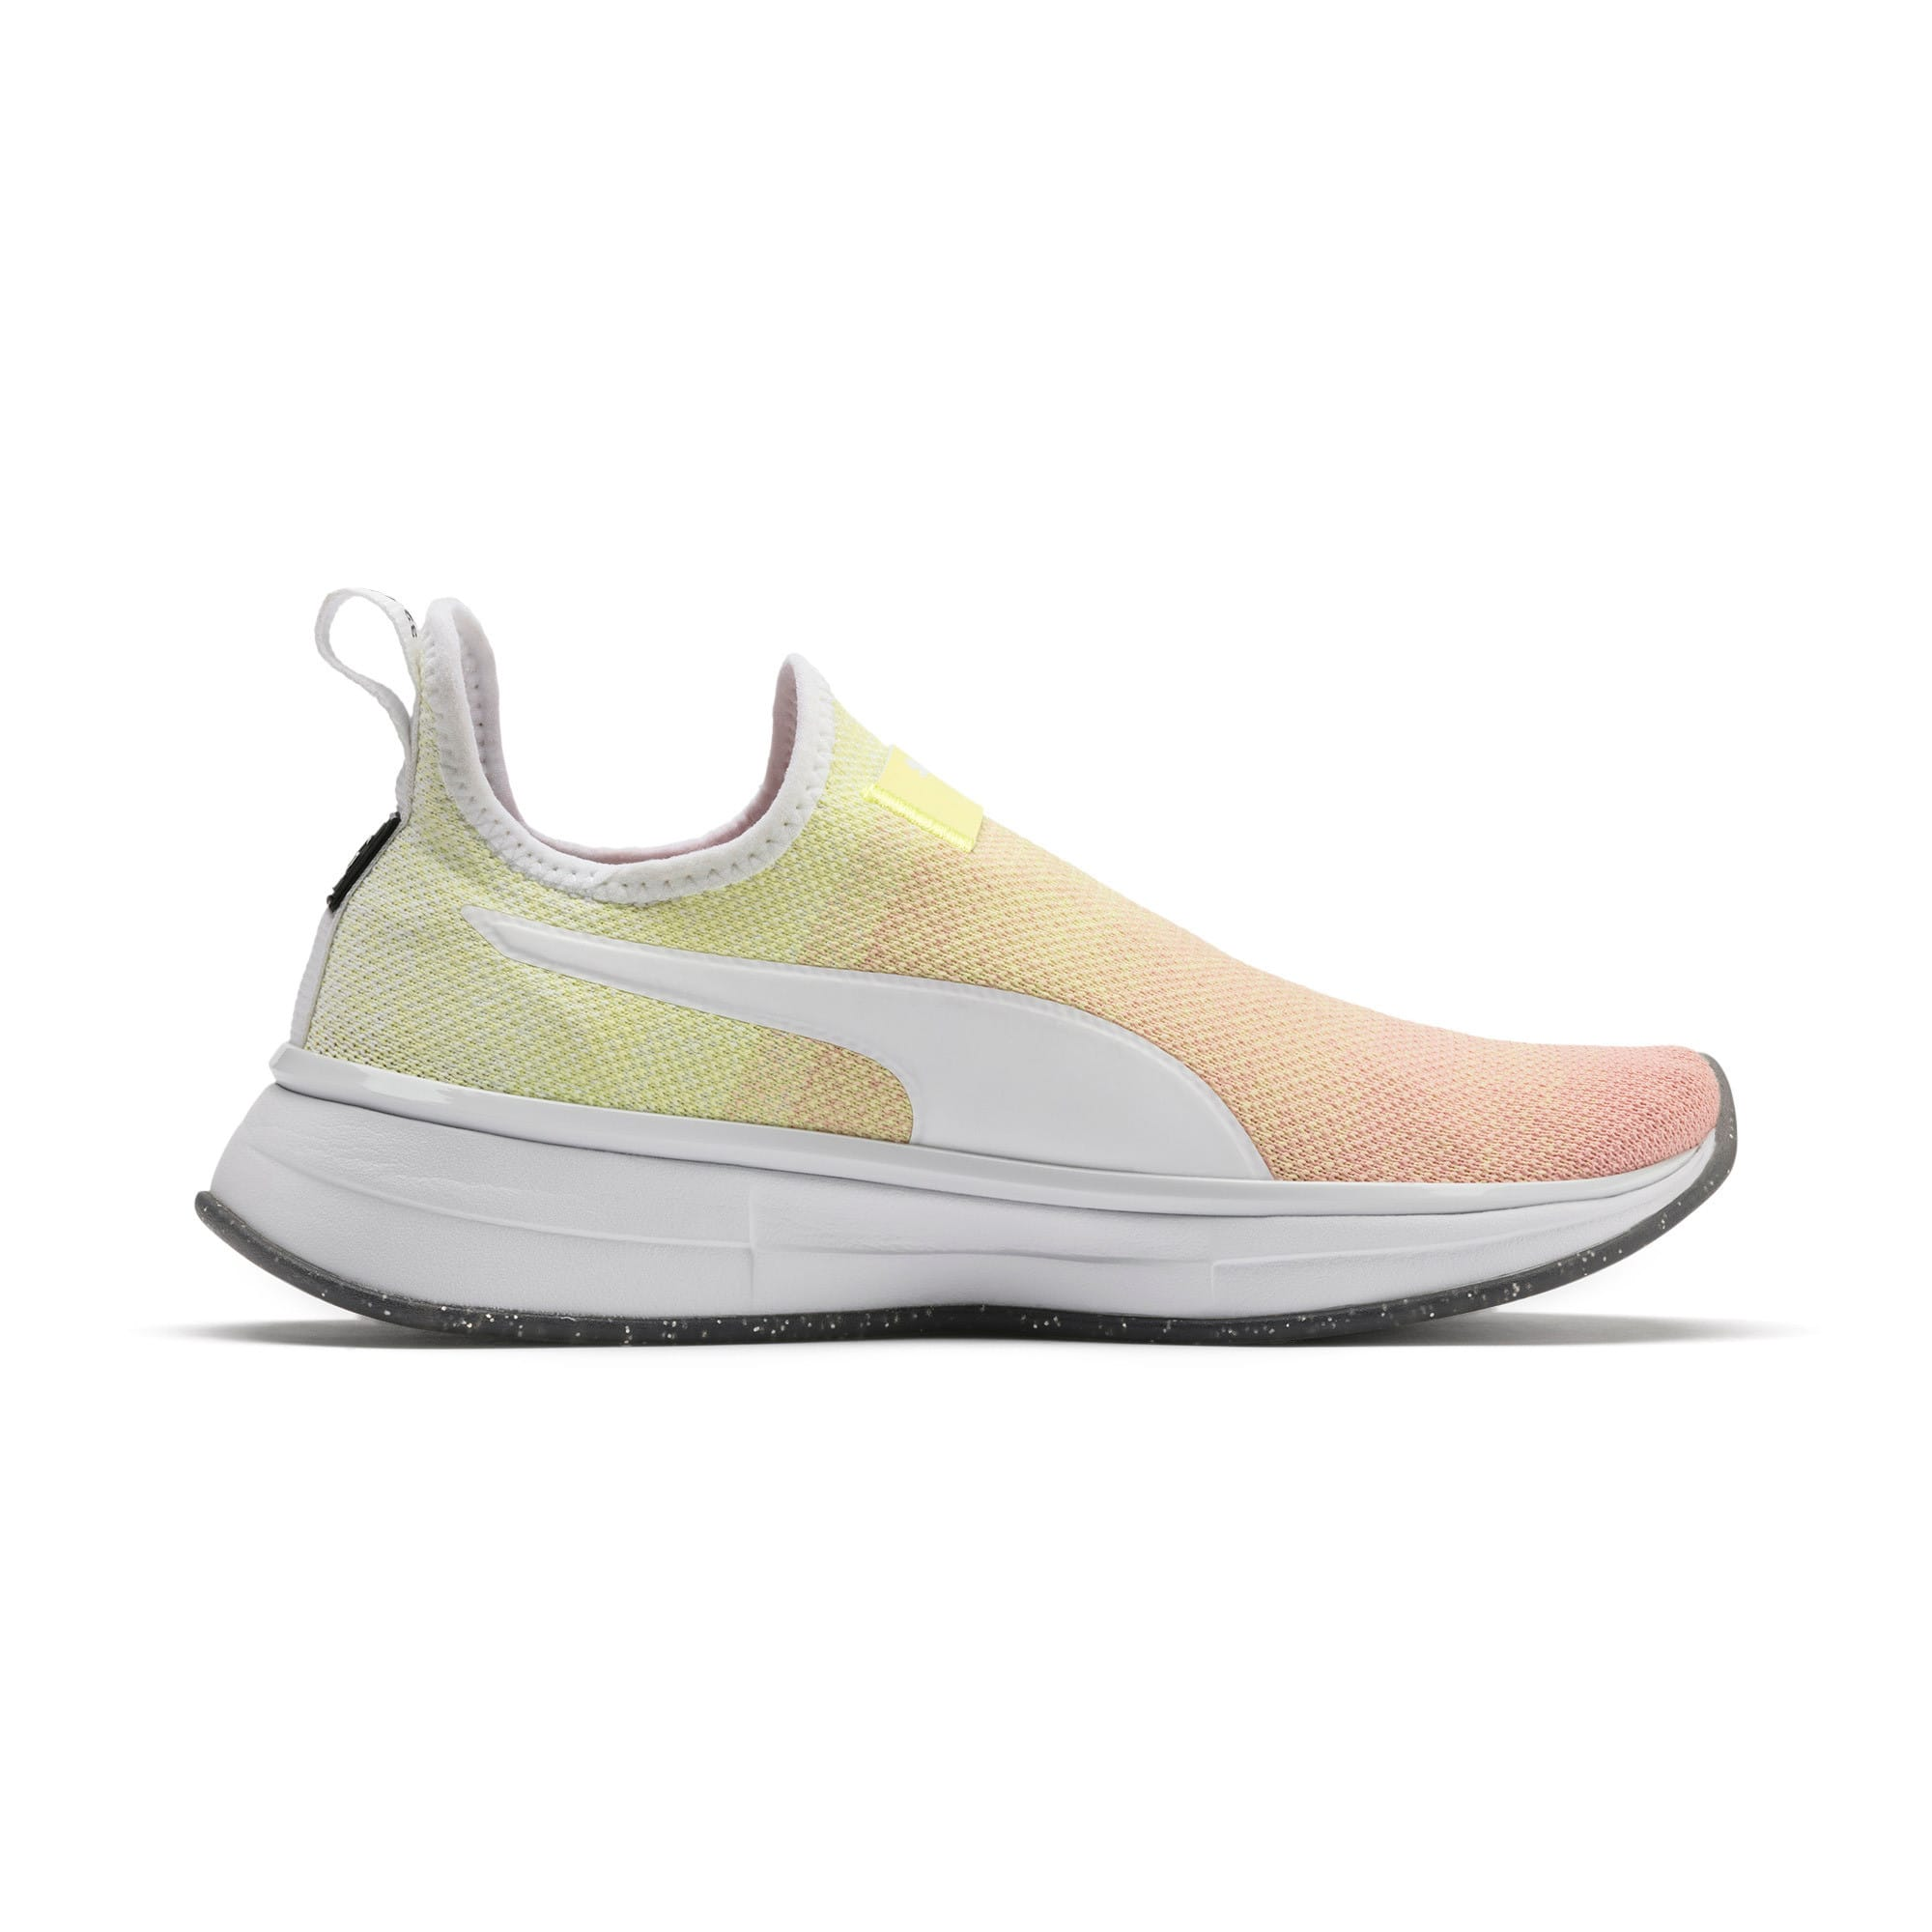 Miniatura 6 de Zapatos de entrenamiento SG Slip-On Sunrise para mujer, YELLOW-Peach Bud-White, mediano